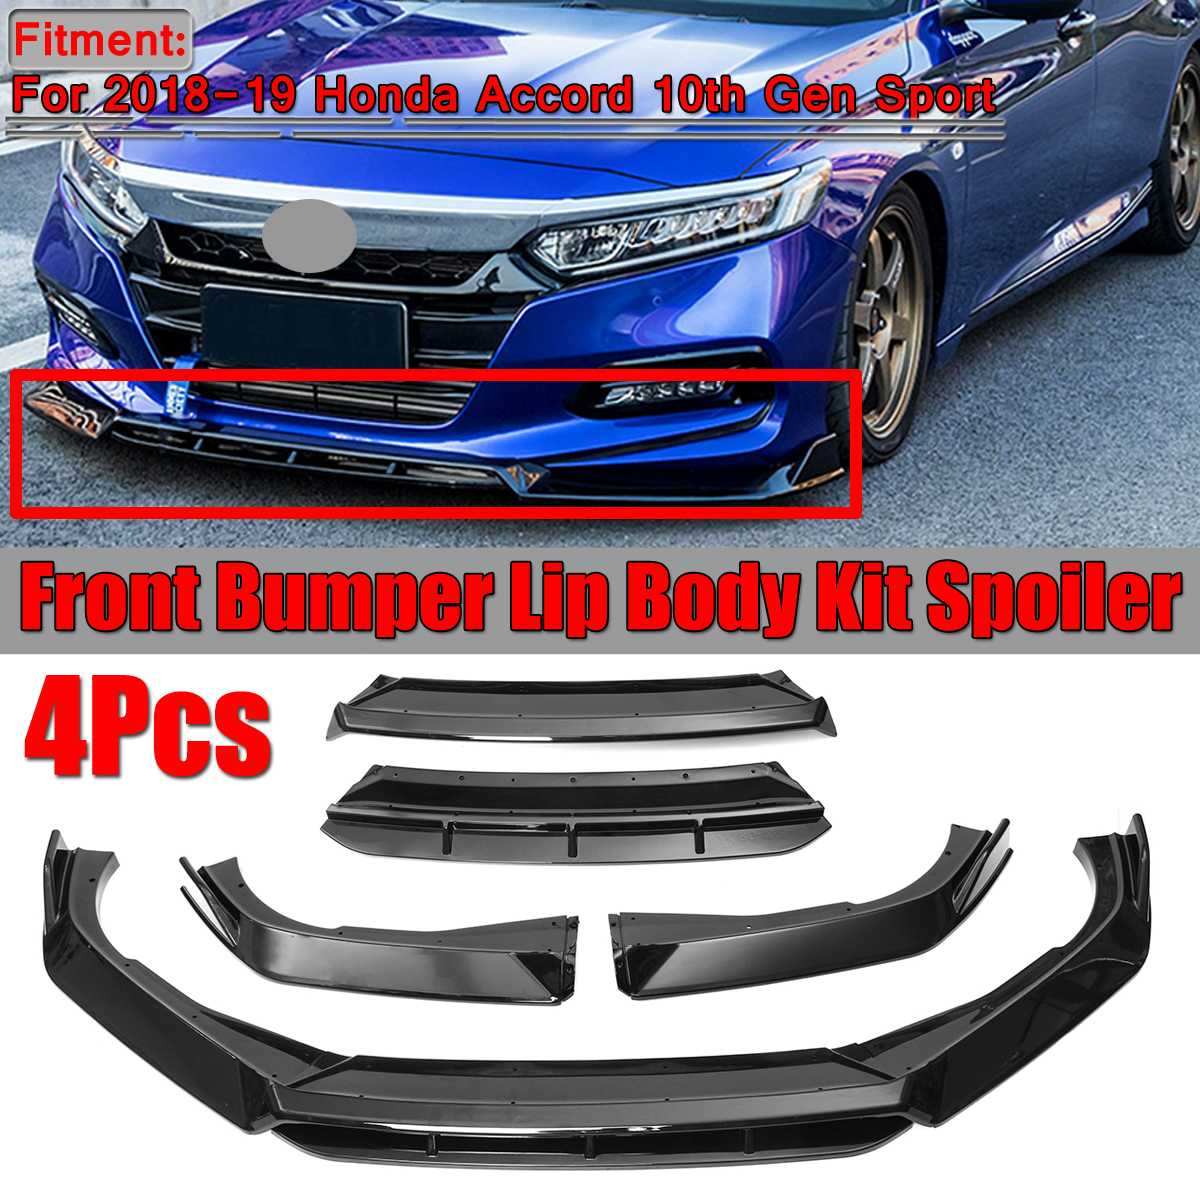 5x Front Bumper Spoiler Black Surround Molding Cover Trim For Honda Accord 18-19